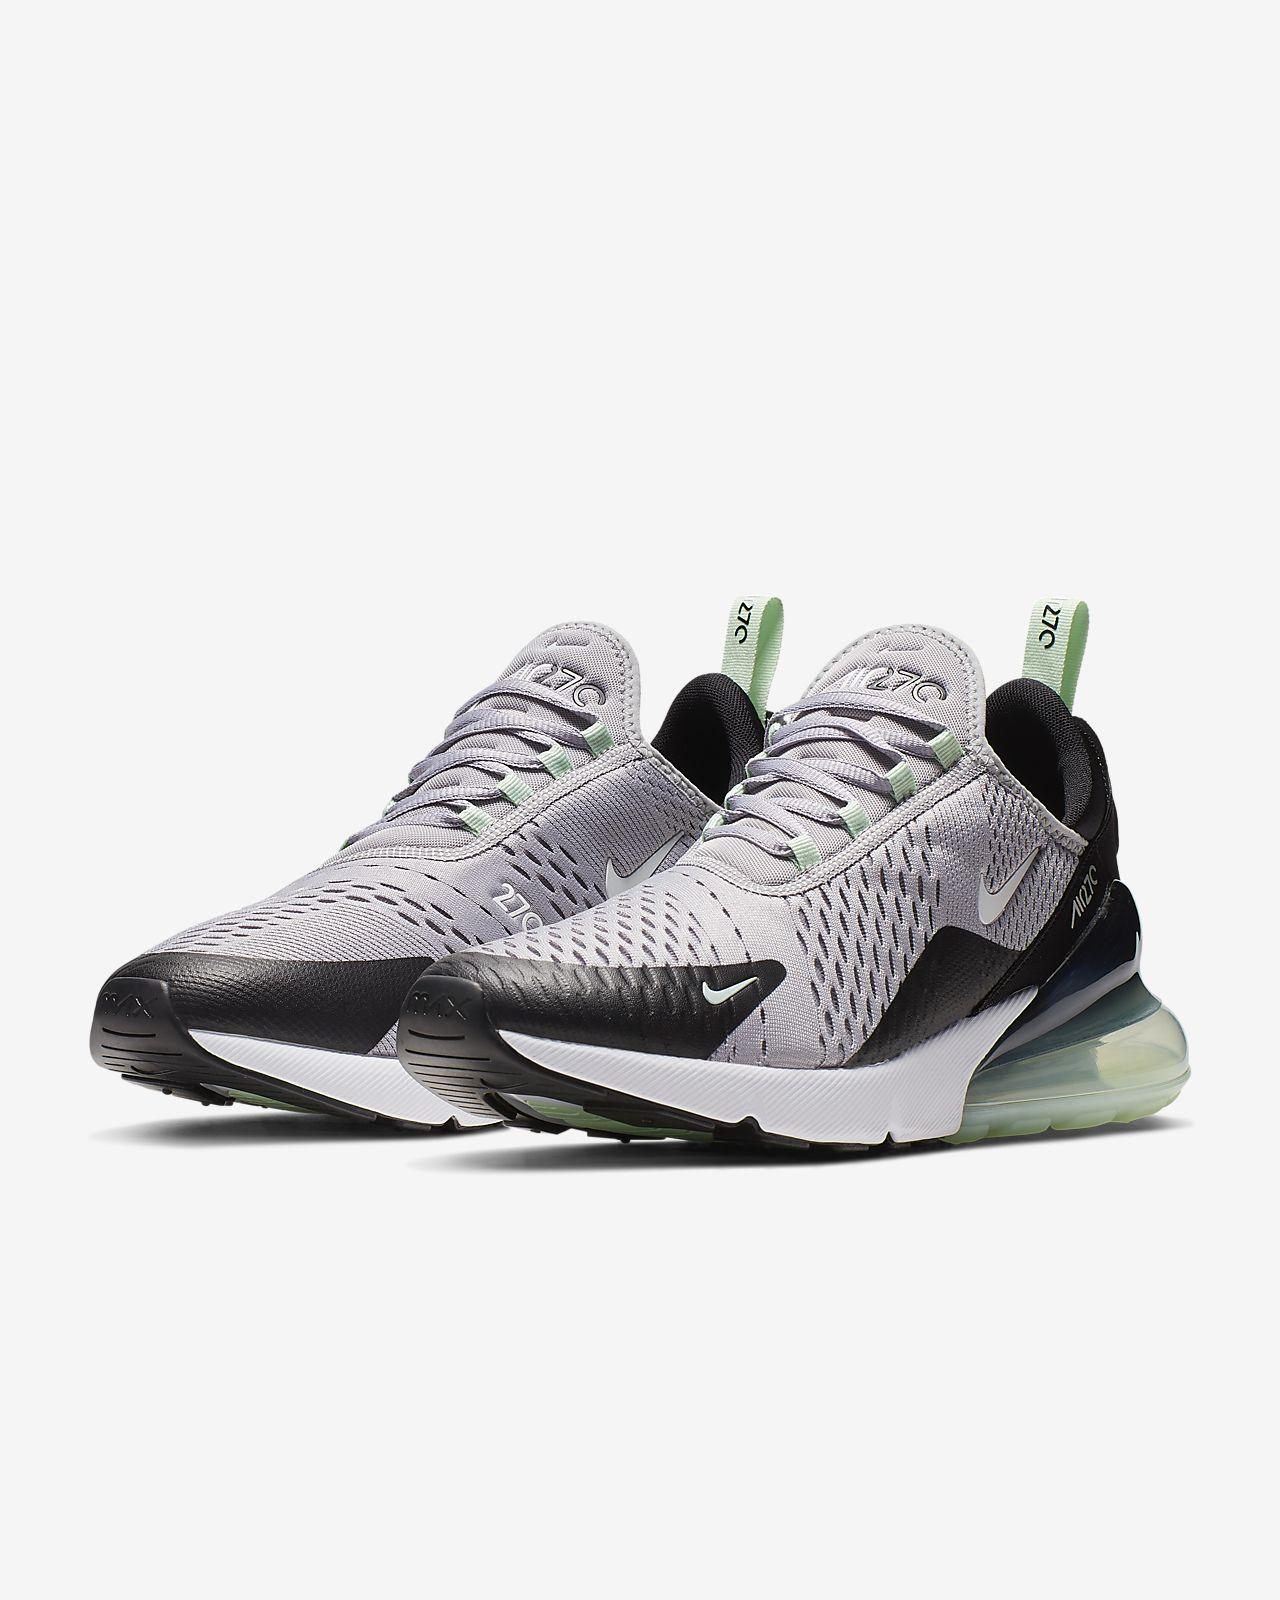 lowest price 8fe1e 2ae6c ... Nike Air Max 270 Men s Shoe